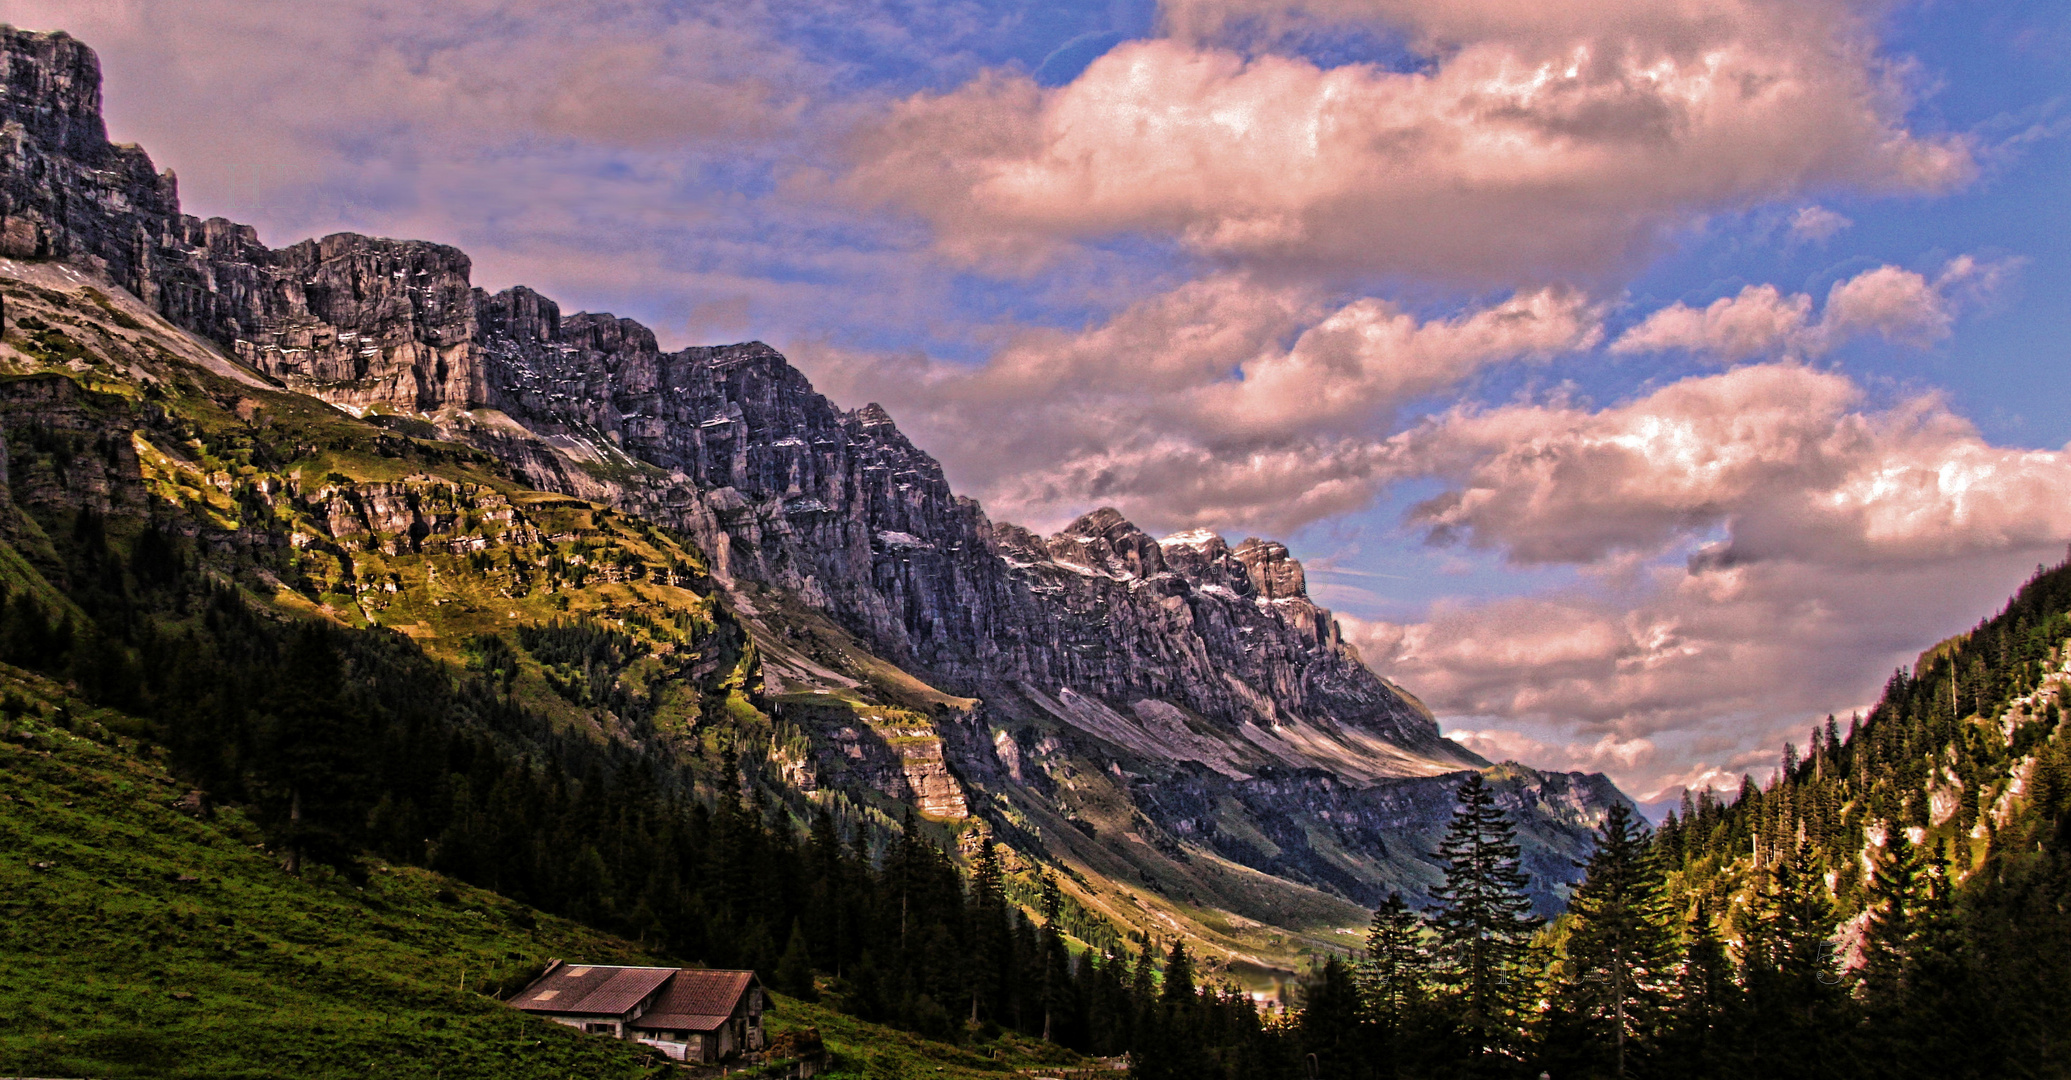 Schweiz Klausenpass HDR (erster versuch)